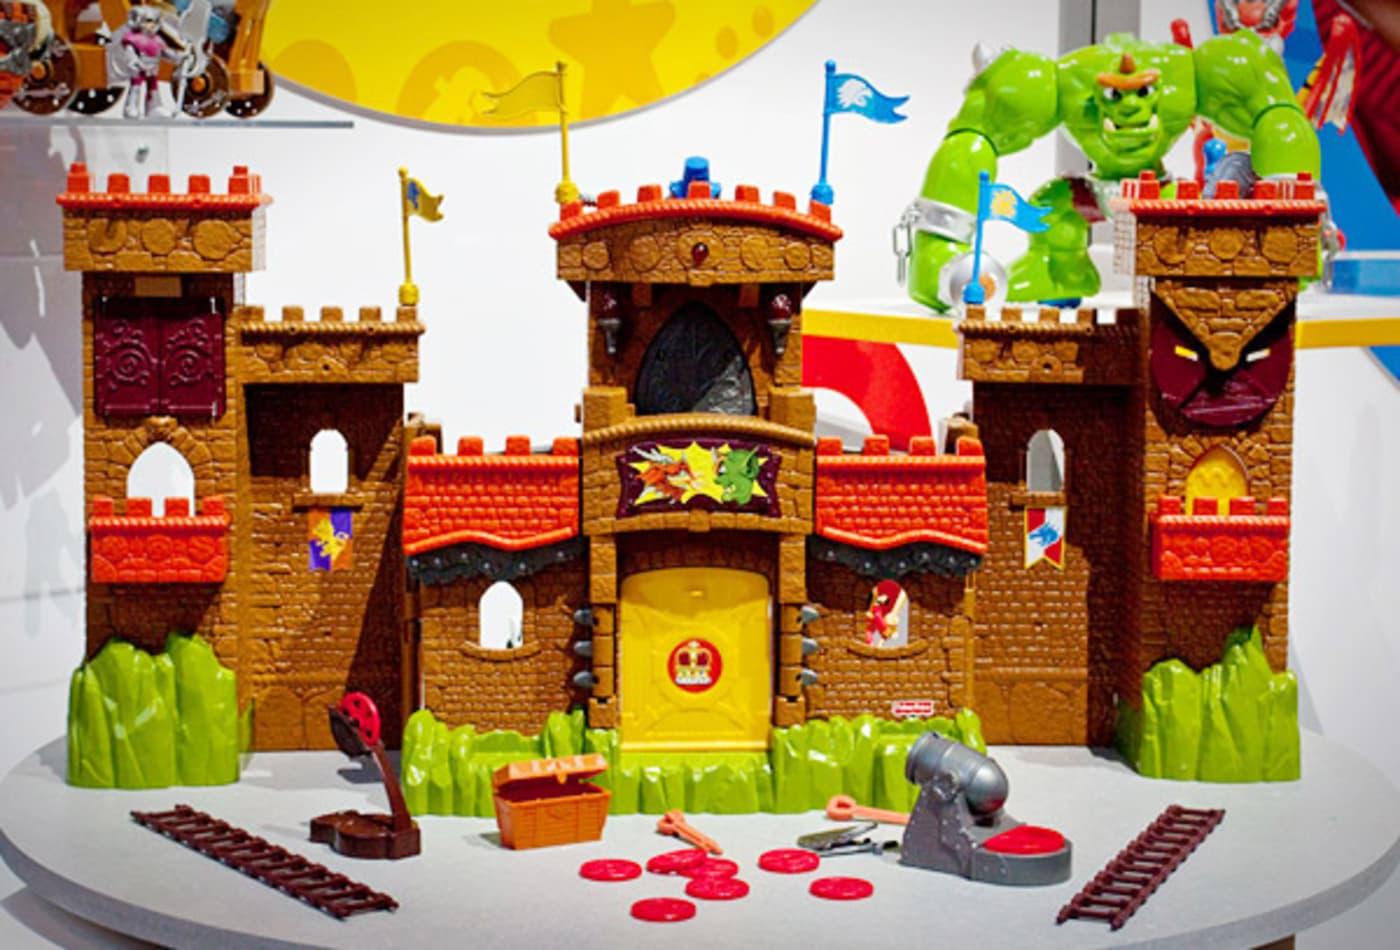 hot-toys-2012-imaginext-eagle-talon-castle.jpg